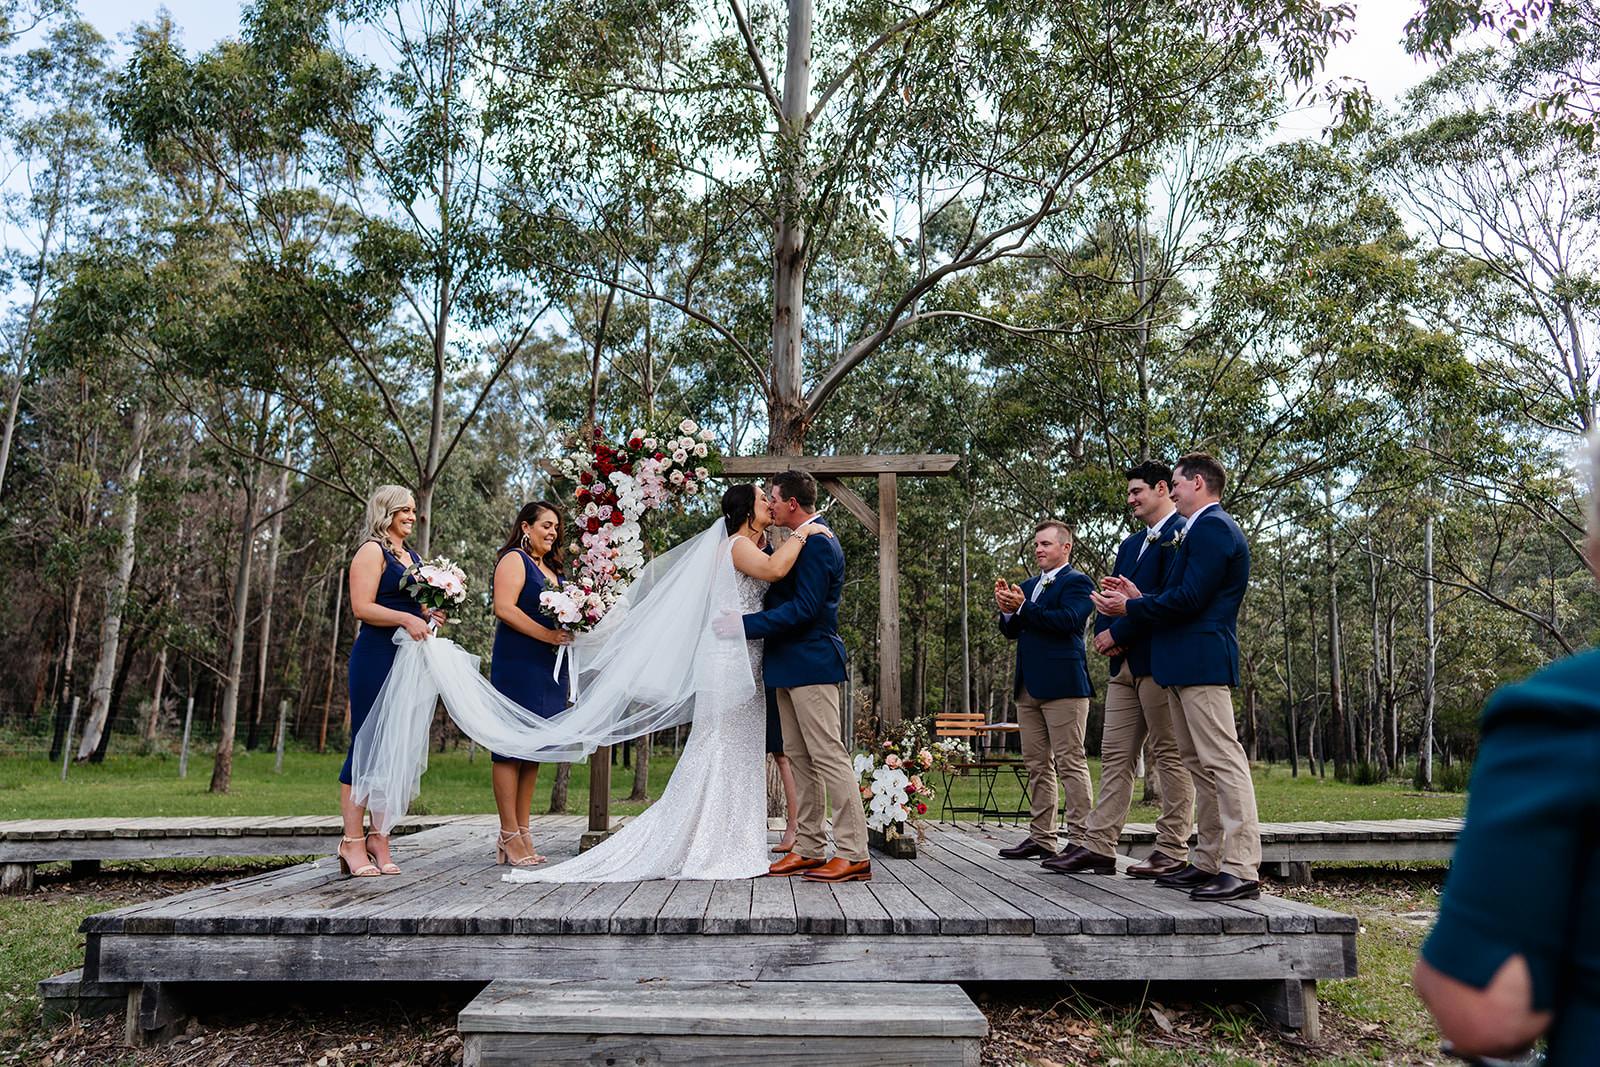 Bush wedding ceremony in Bawley Point, South Coast NSW